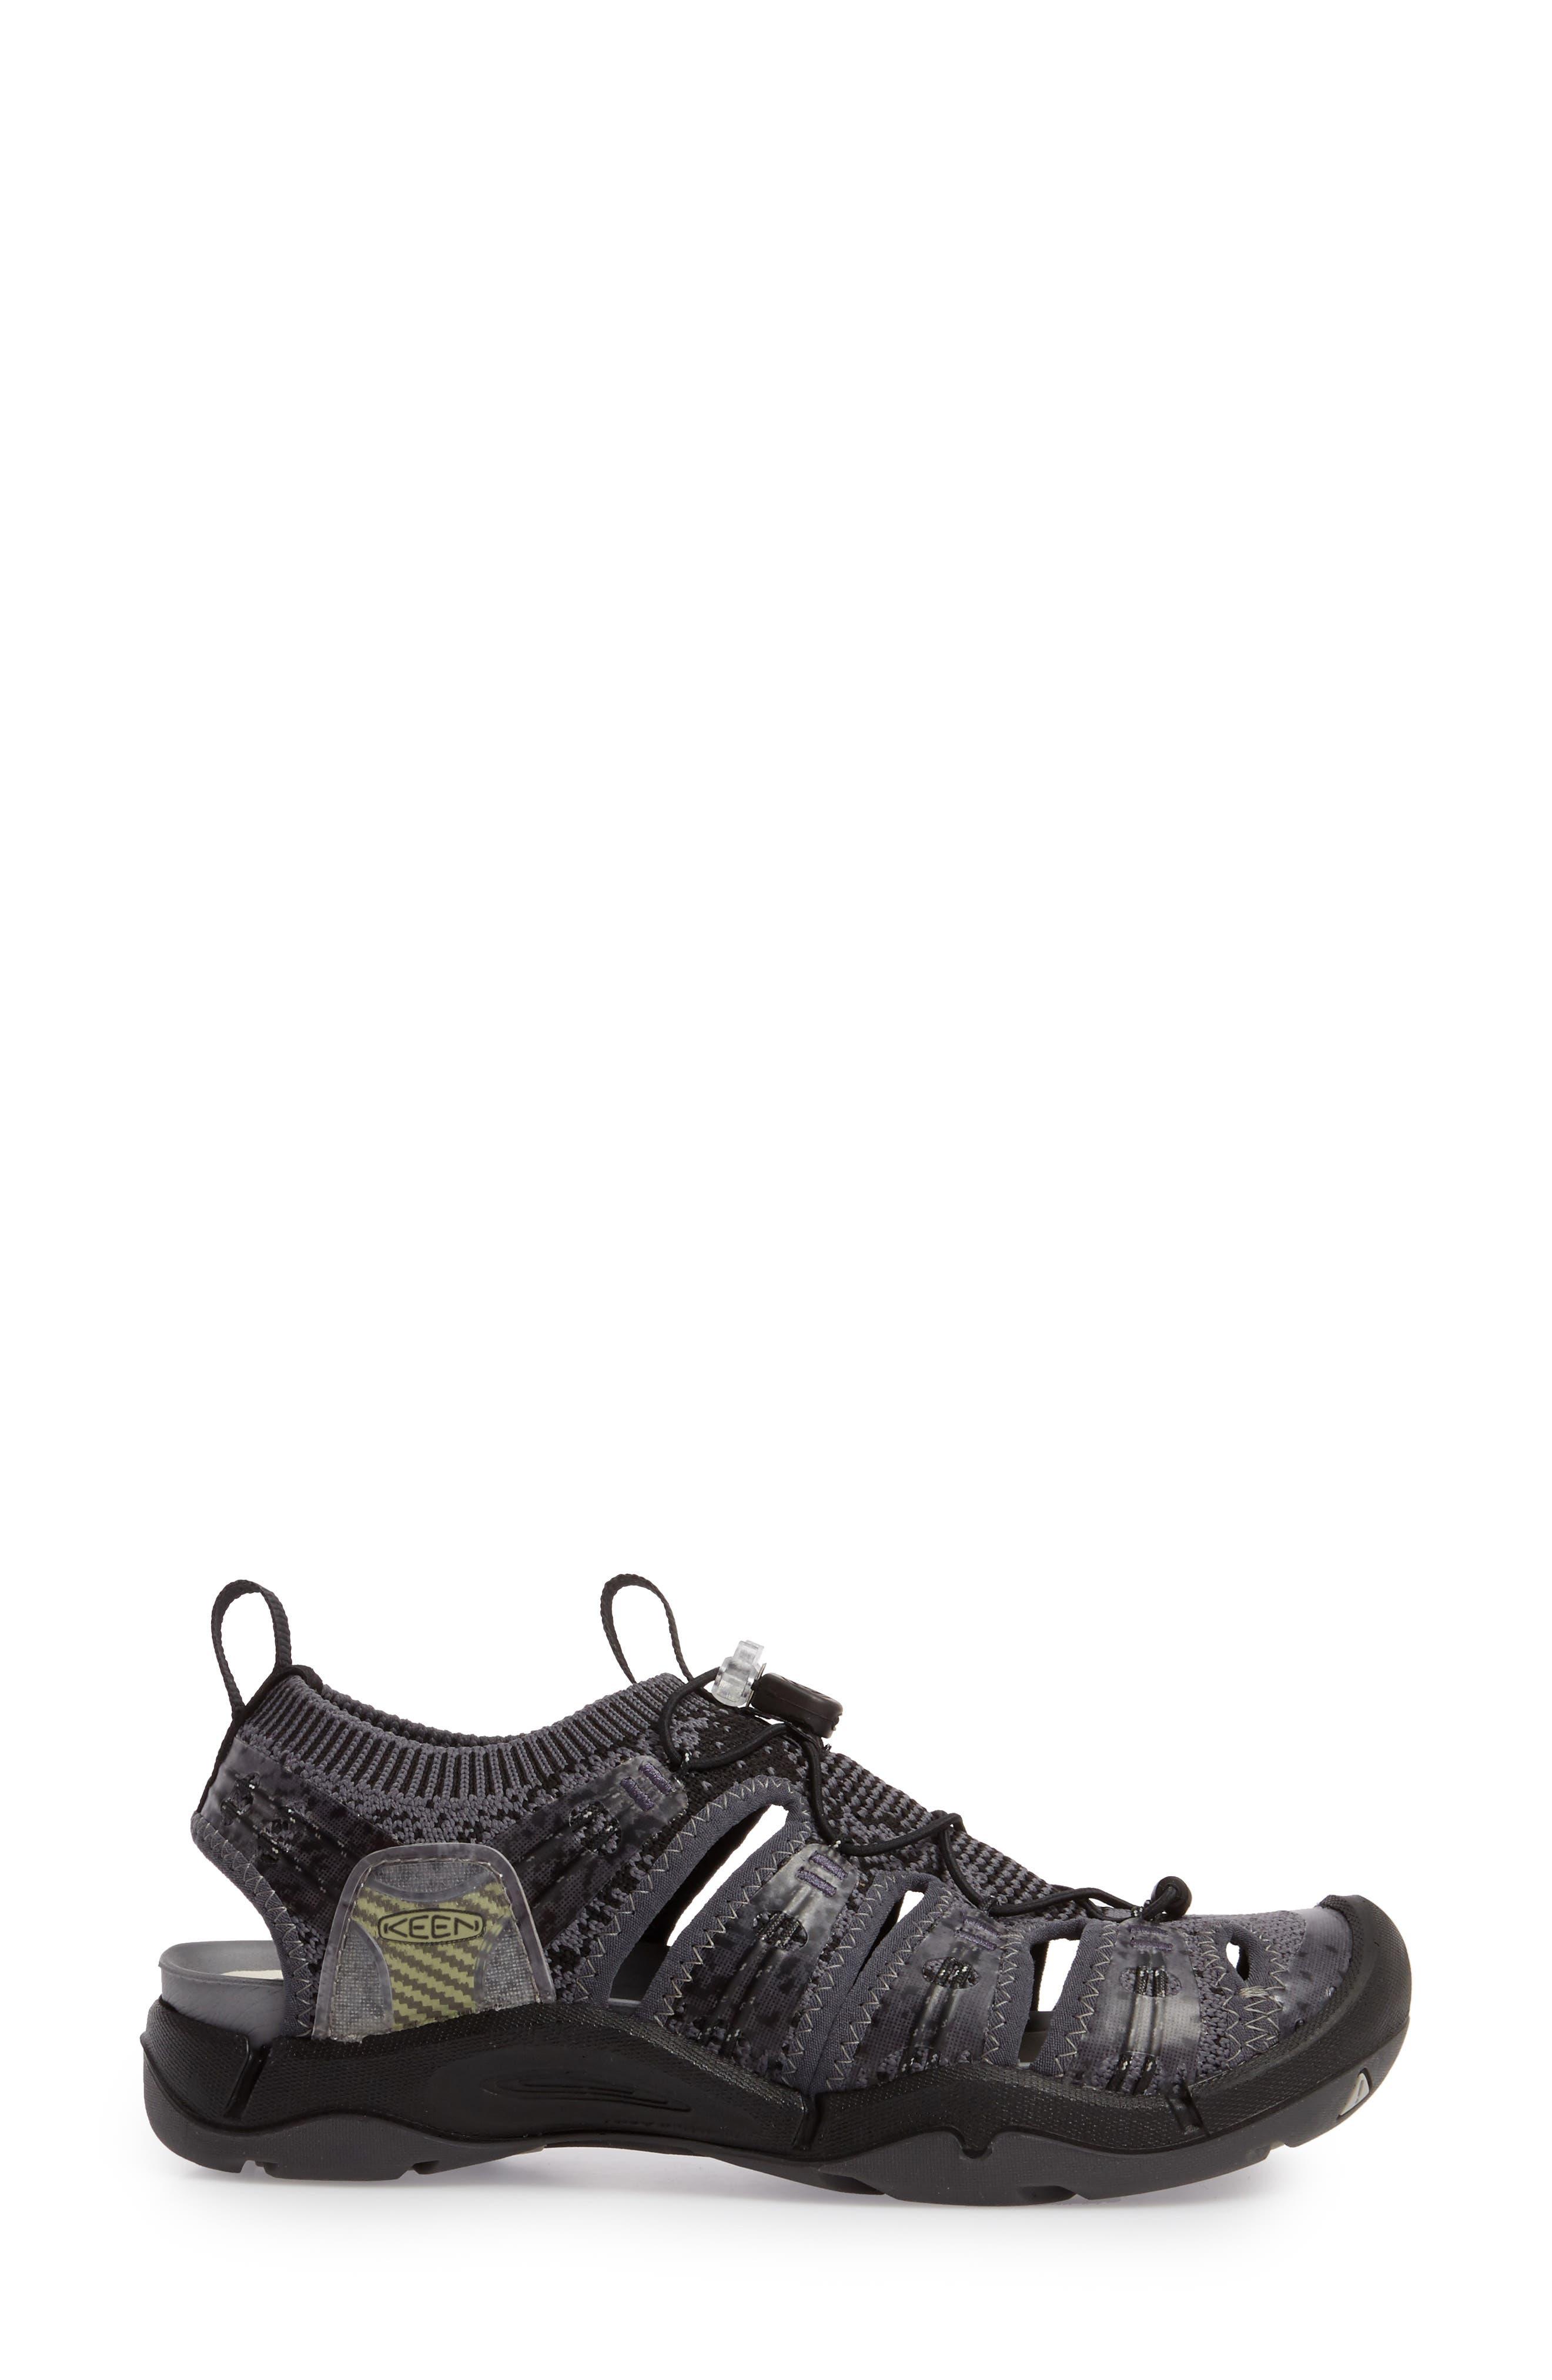 EVOFIT One Sandal,                             Alternate thumbnail 3, color,                             Heathered Black/ Magnet